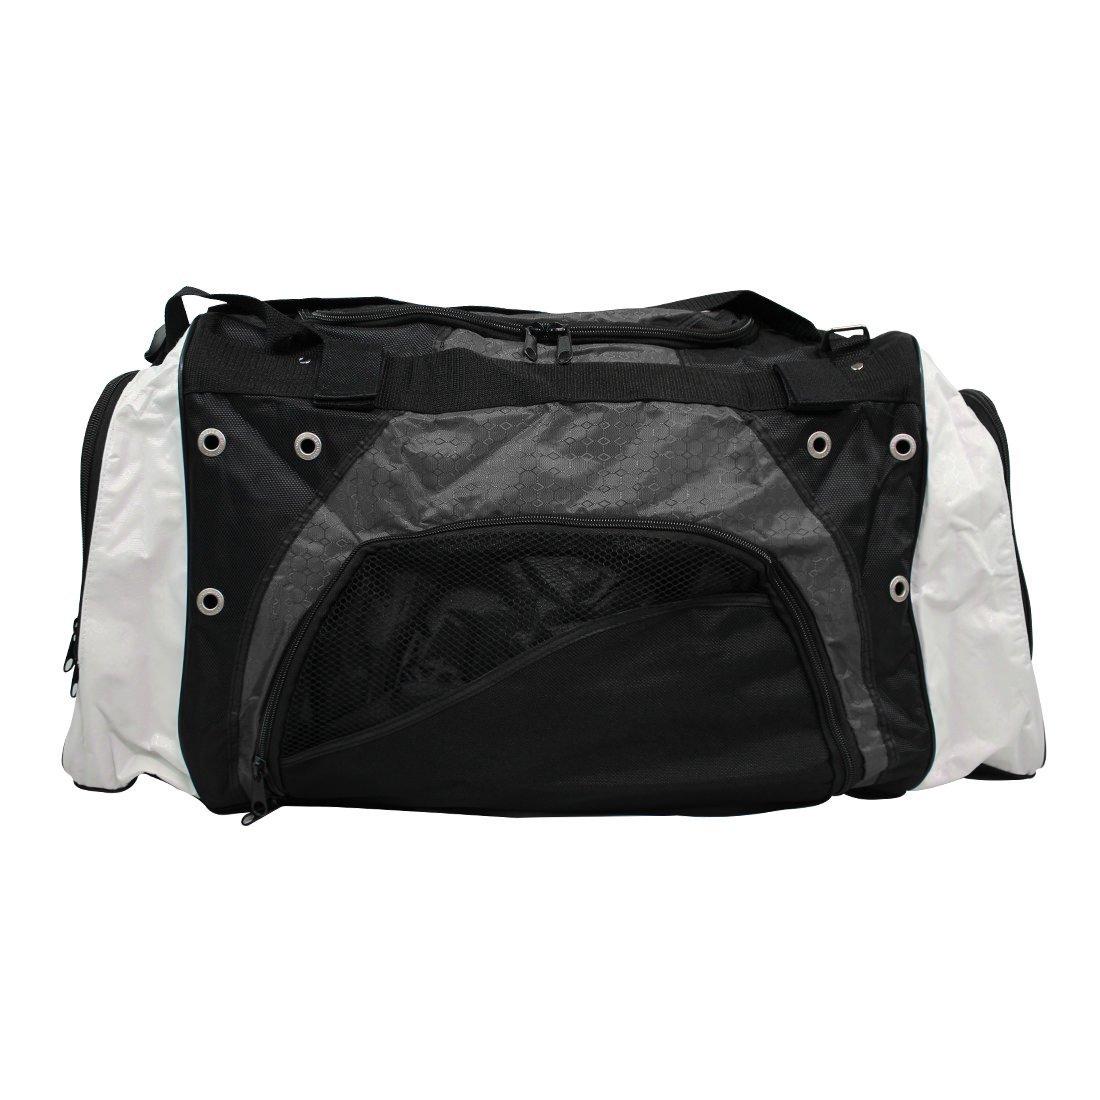 Lacrosse Unlimited Recon Duffle Bag - Grey